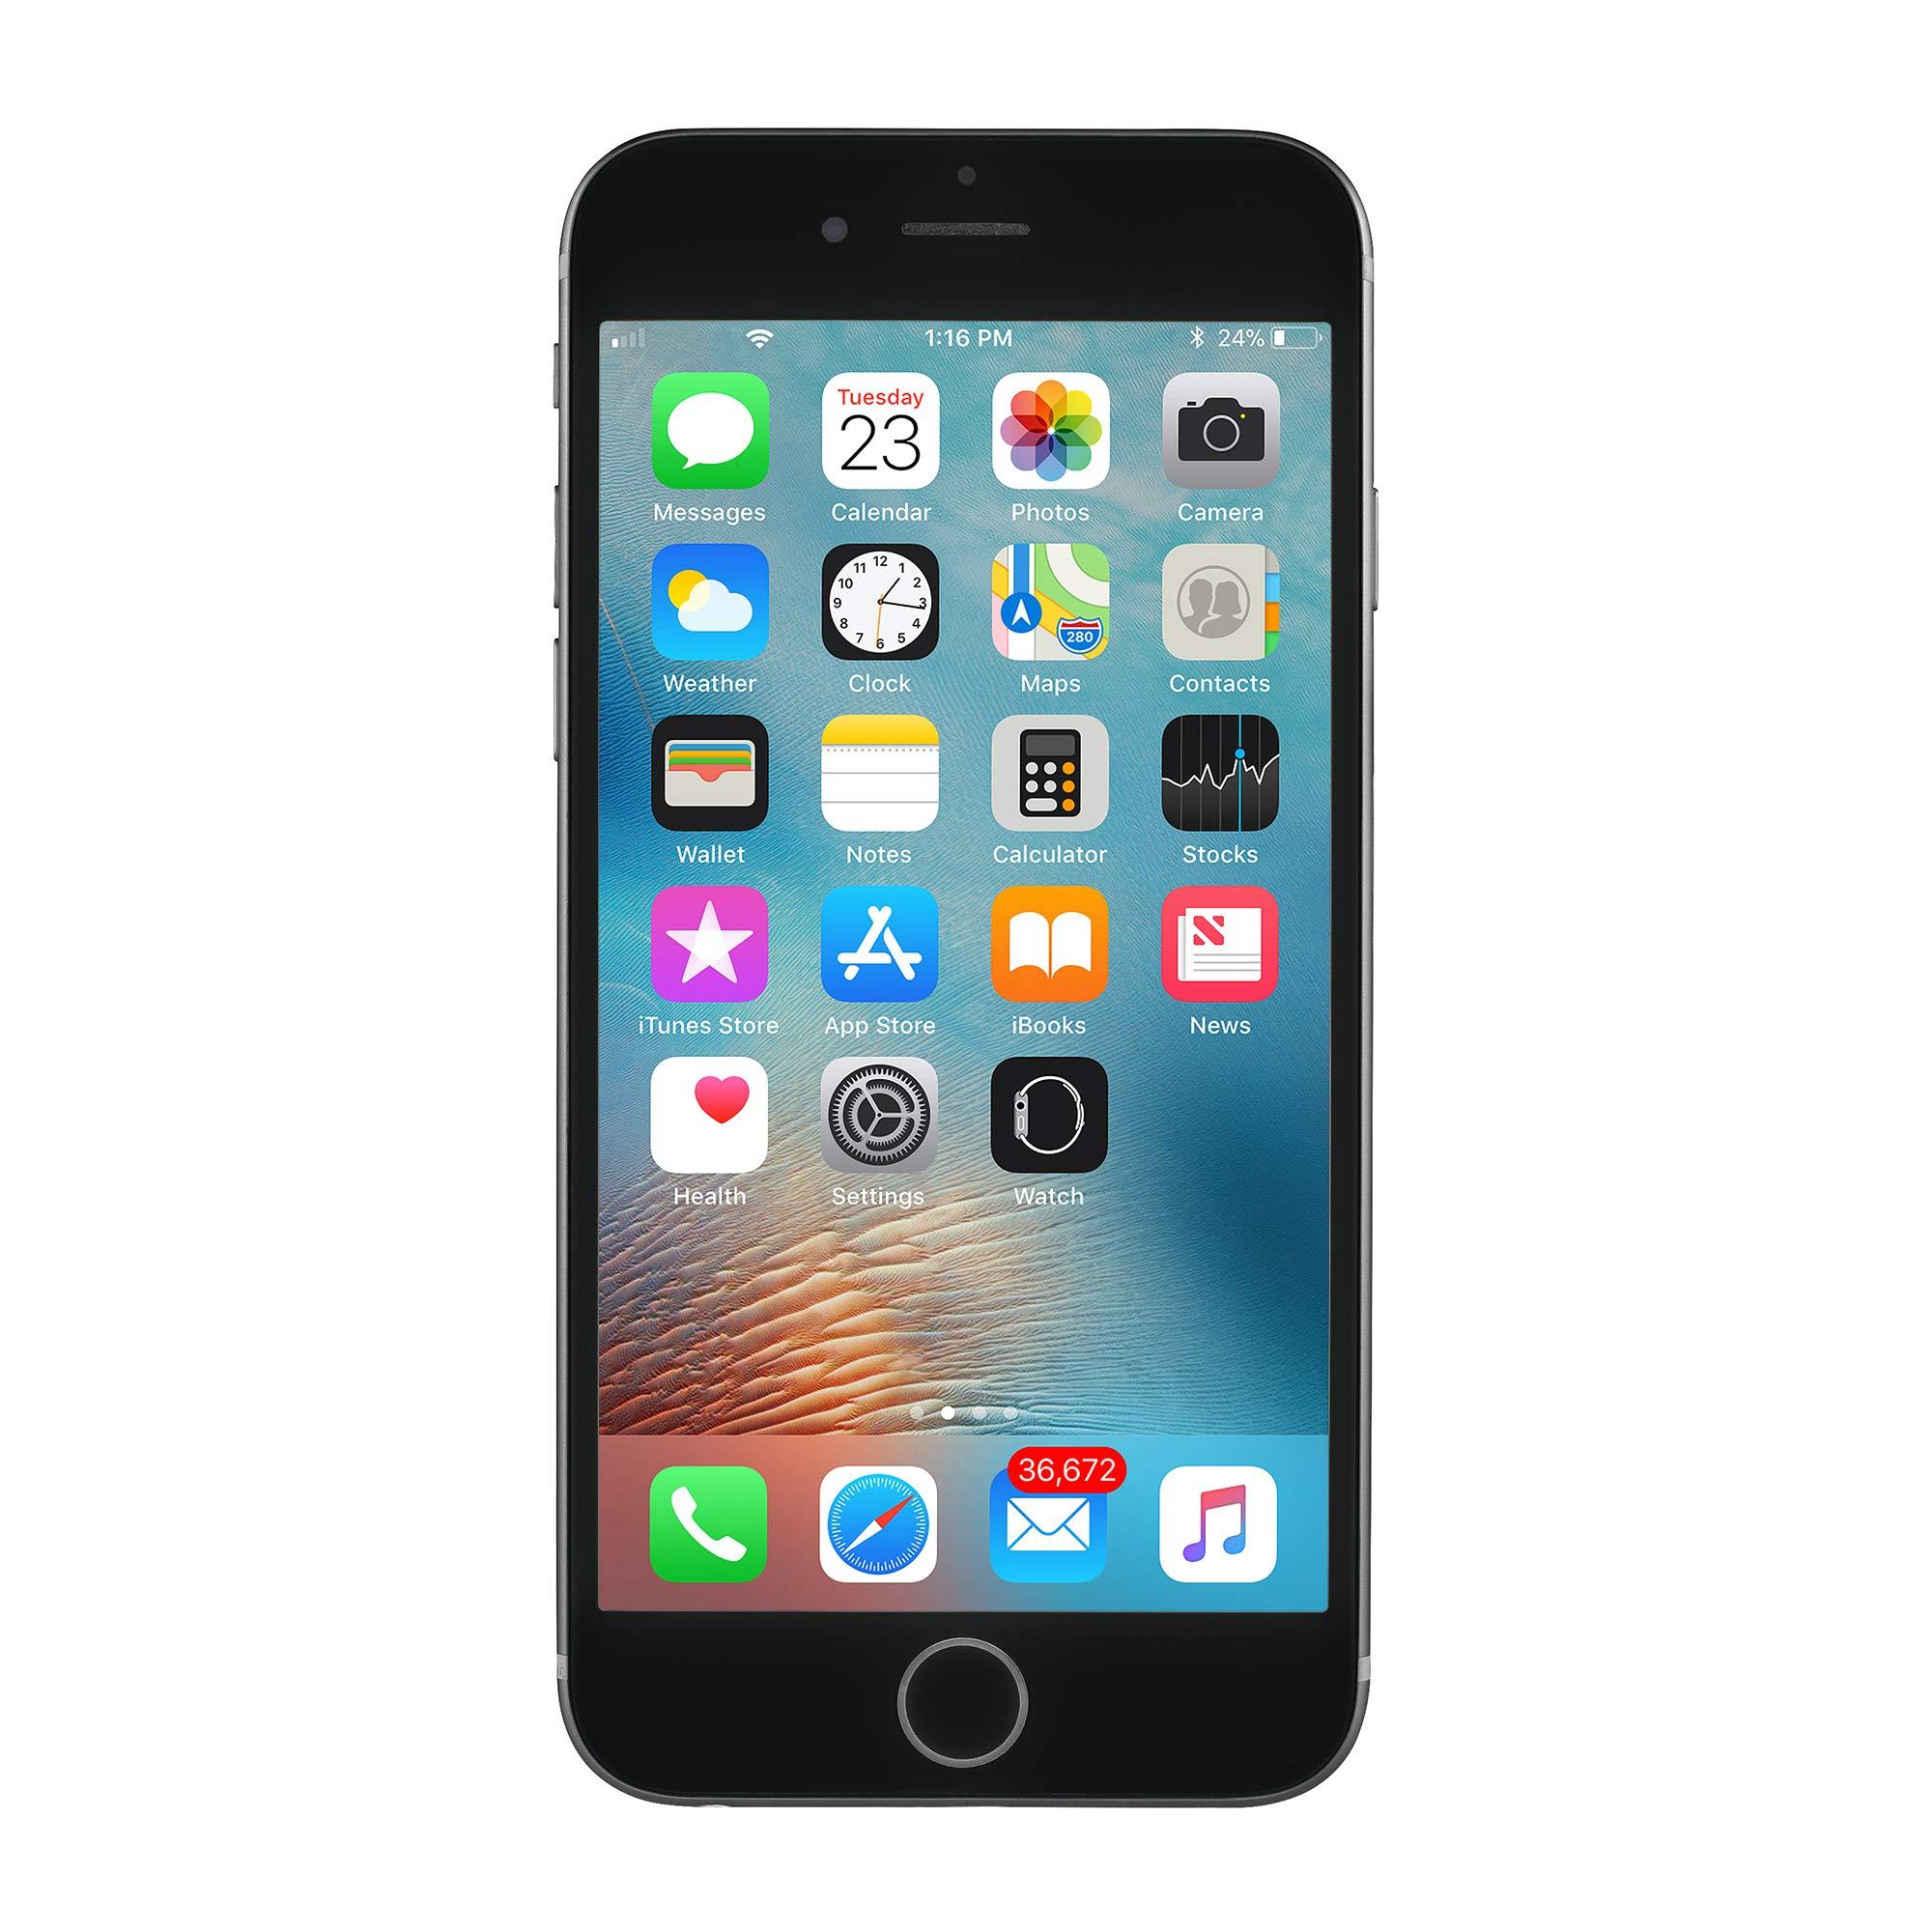 Apple iPhone 6S, GSM Unlocked, 16GB - Space Gray (Renewed) by Apple